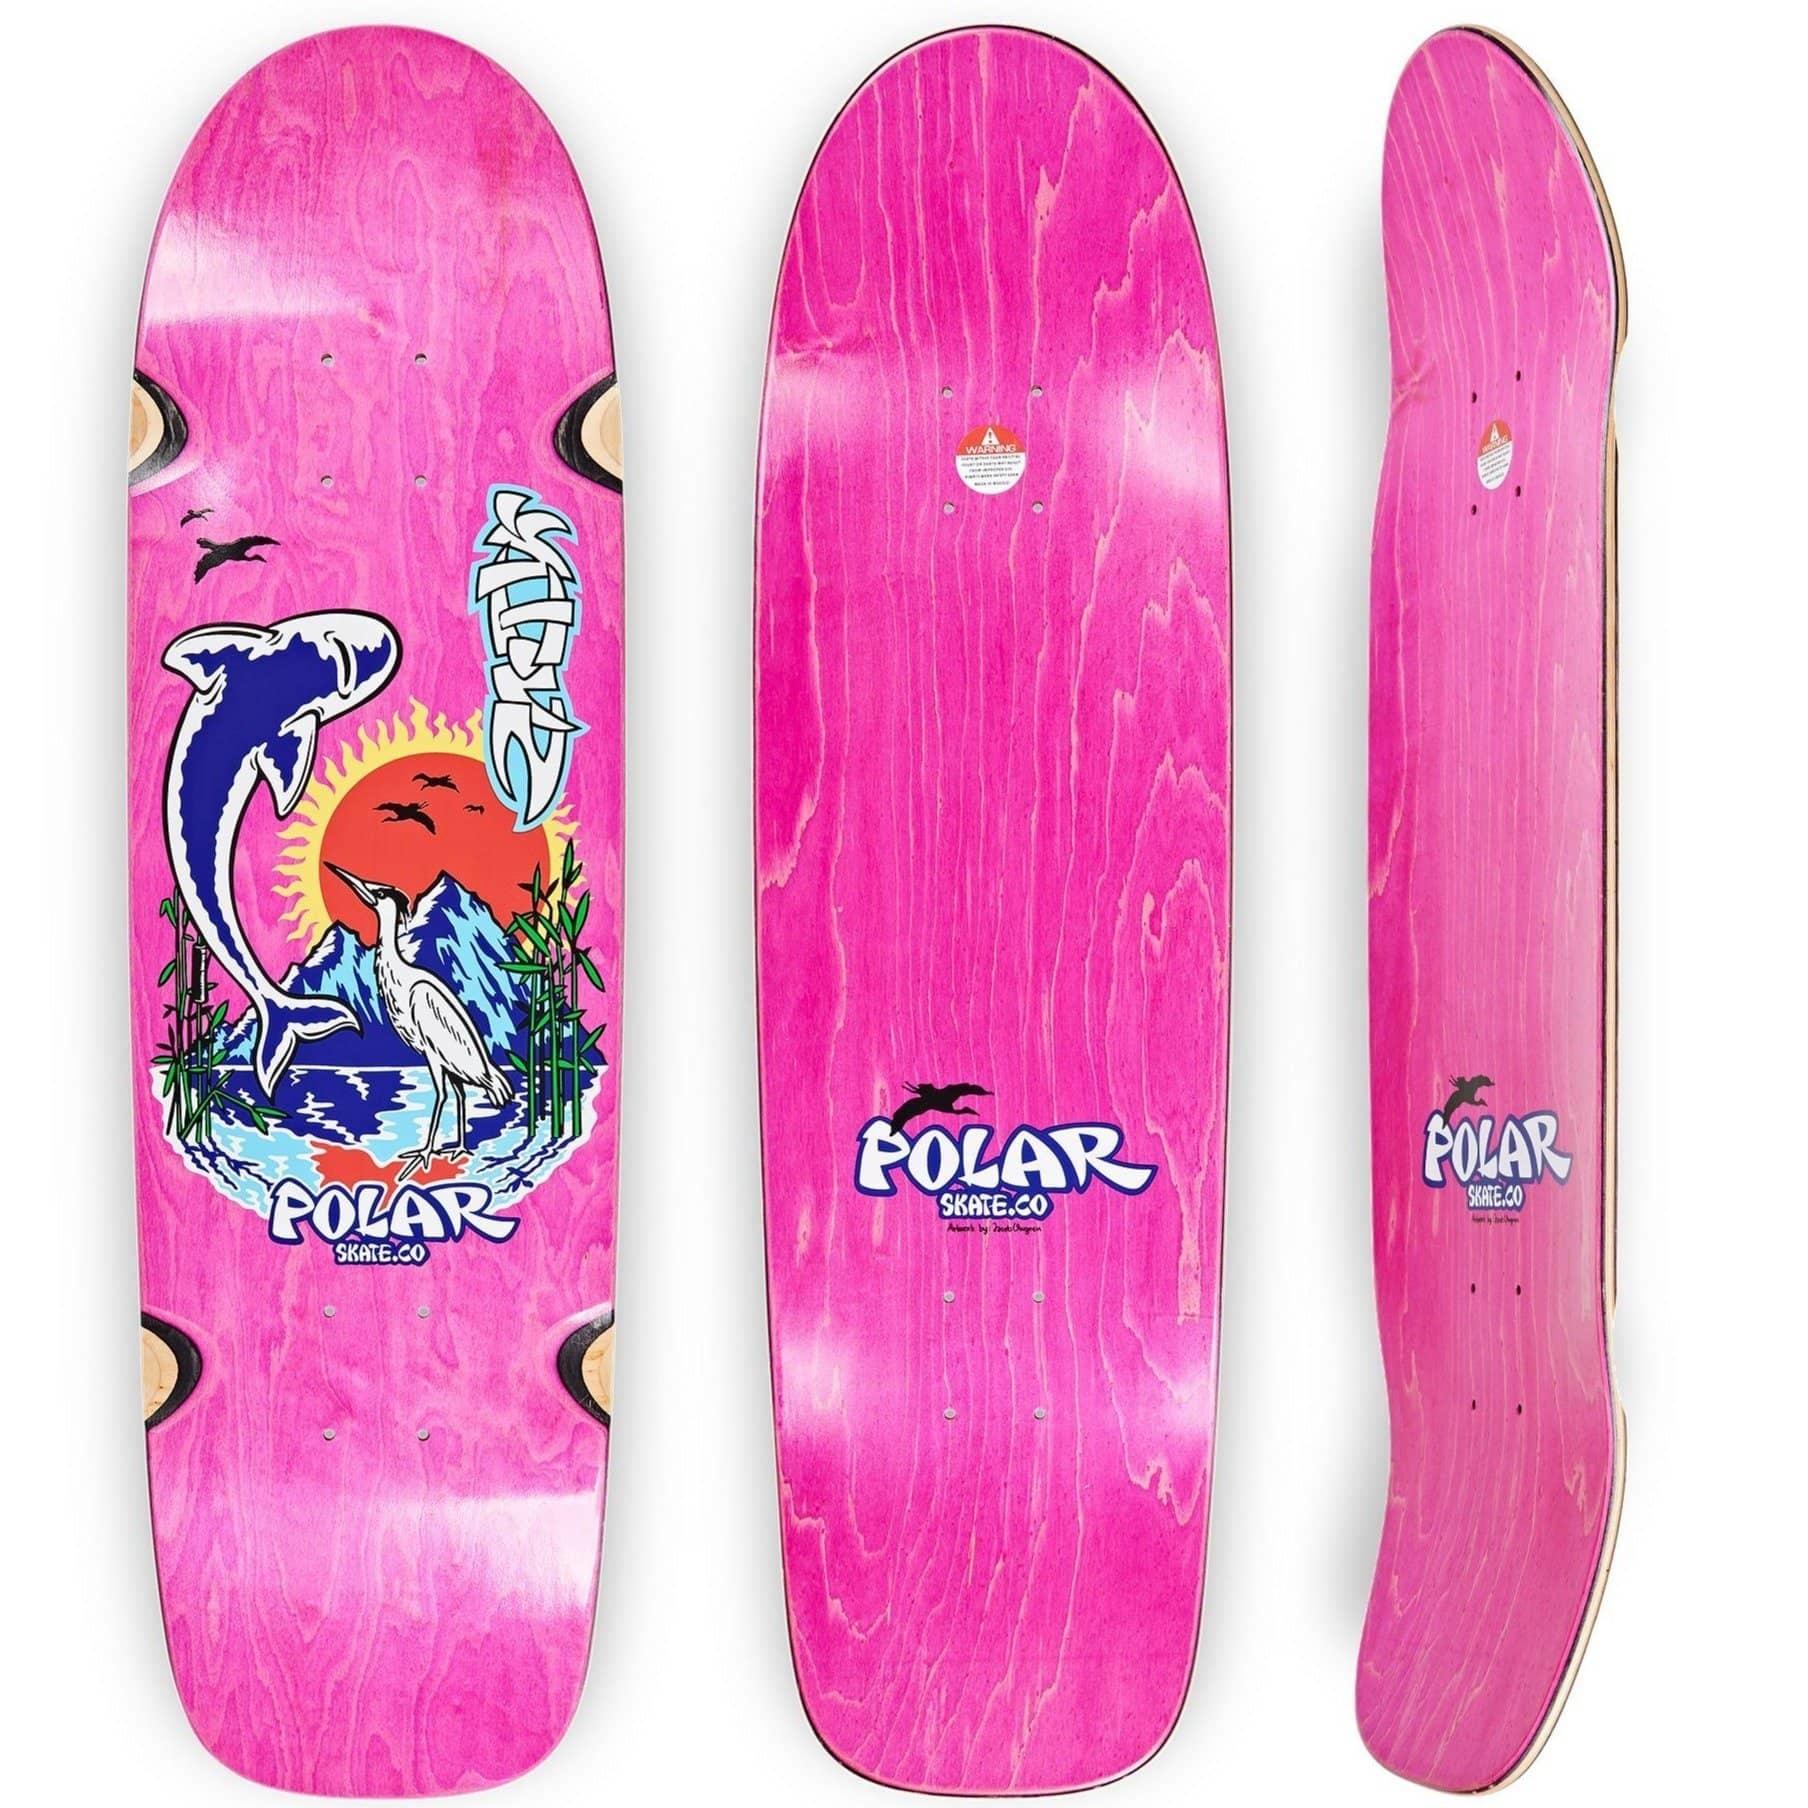 Polar Skate Co. Mt Fuji Sanbongi  Wheel Wells Surf Jr Shape